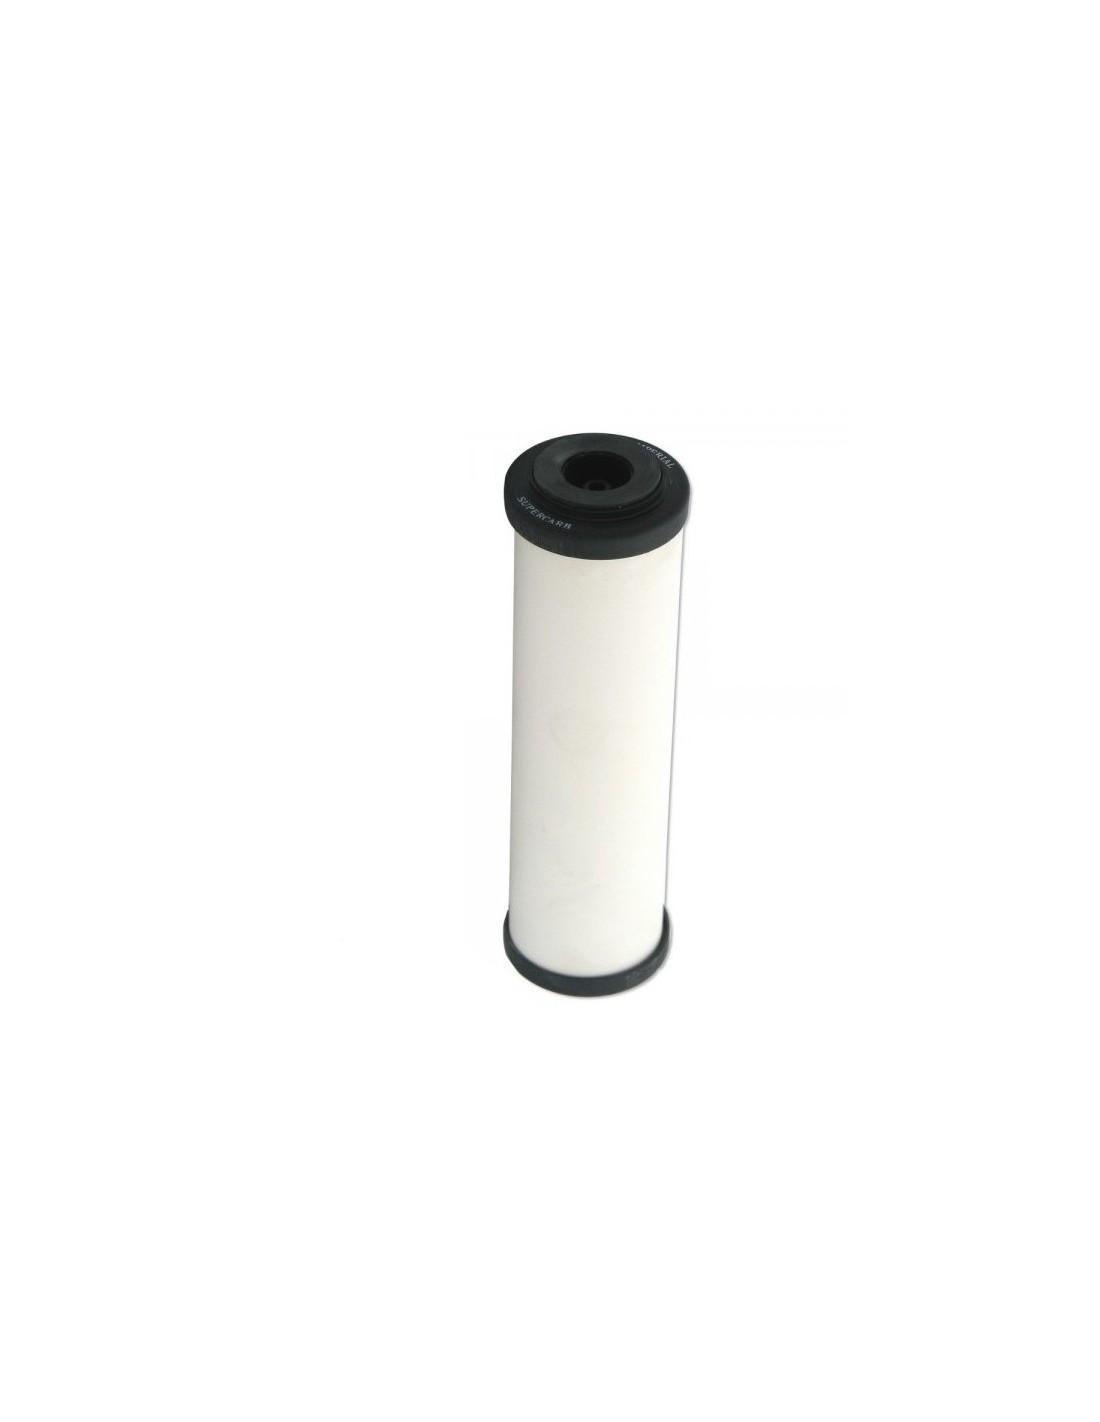 kf 16 ultracarb keramik aktivkohle wasserfilter mit bleientfernung. Black Bedroom Furniture Sets. Home Design Ideas